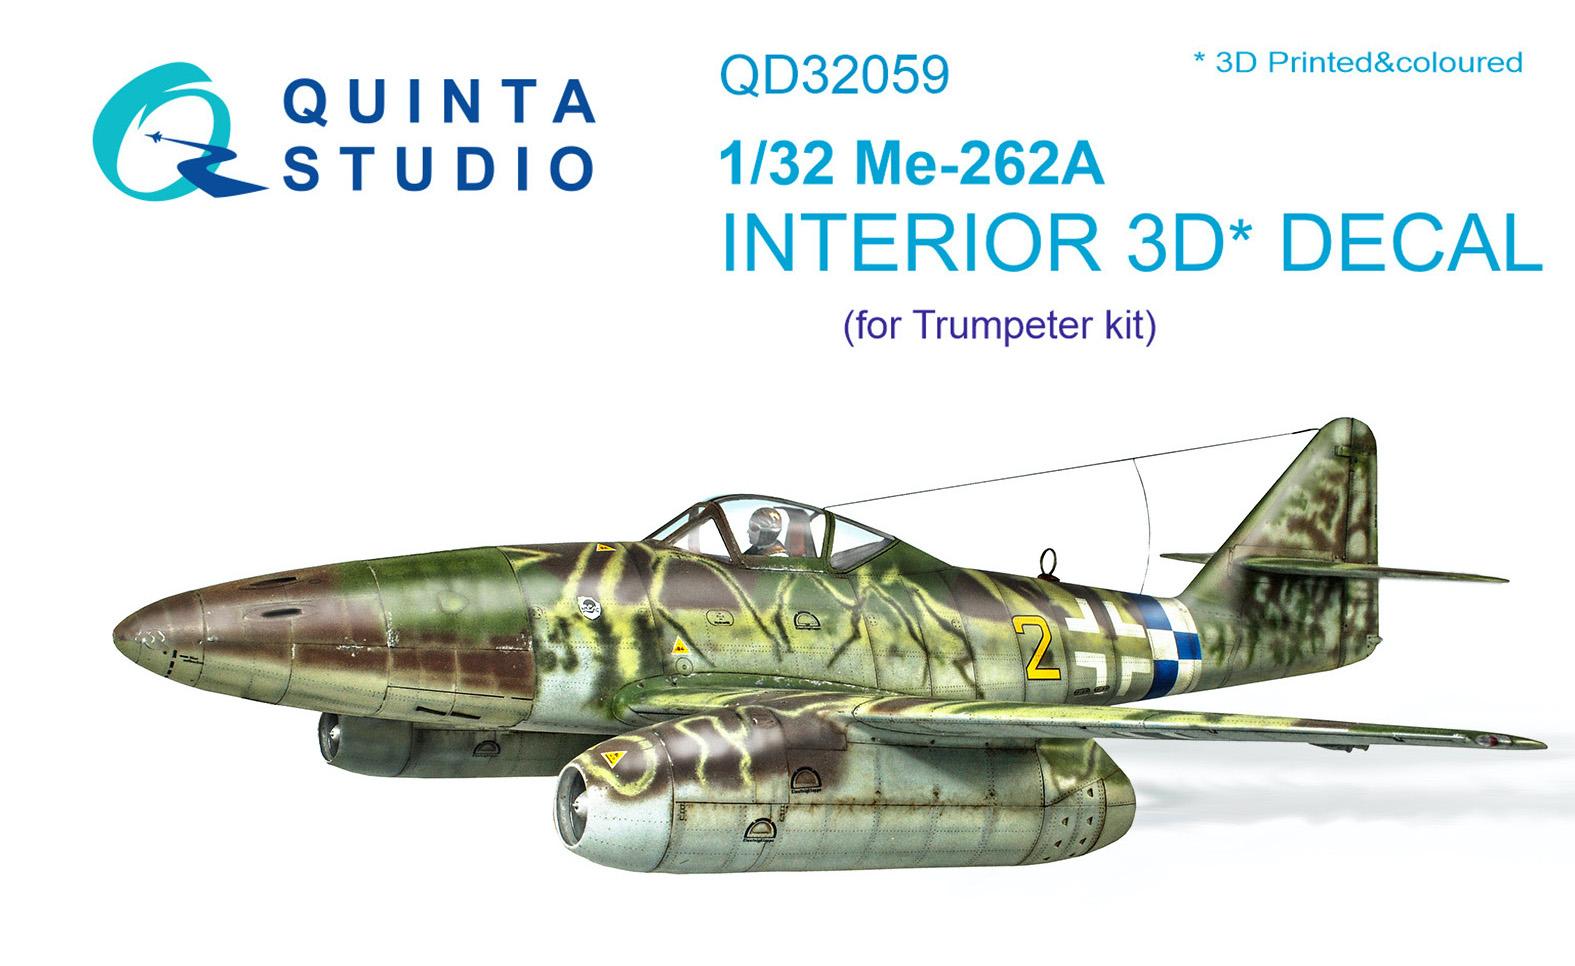 QD32059